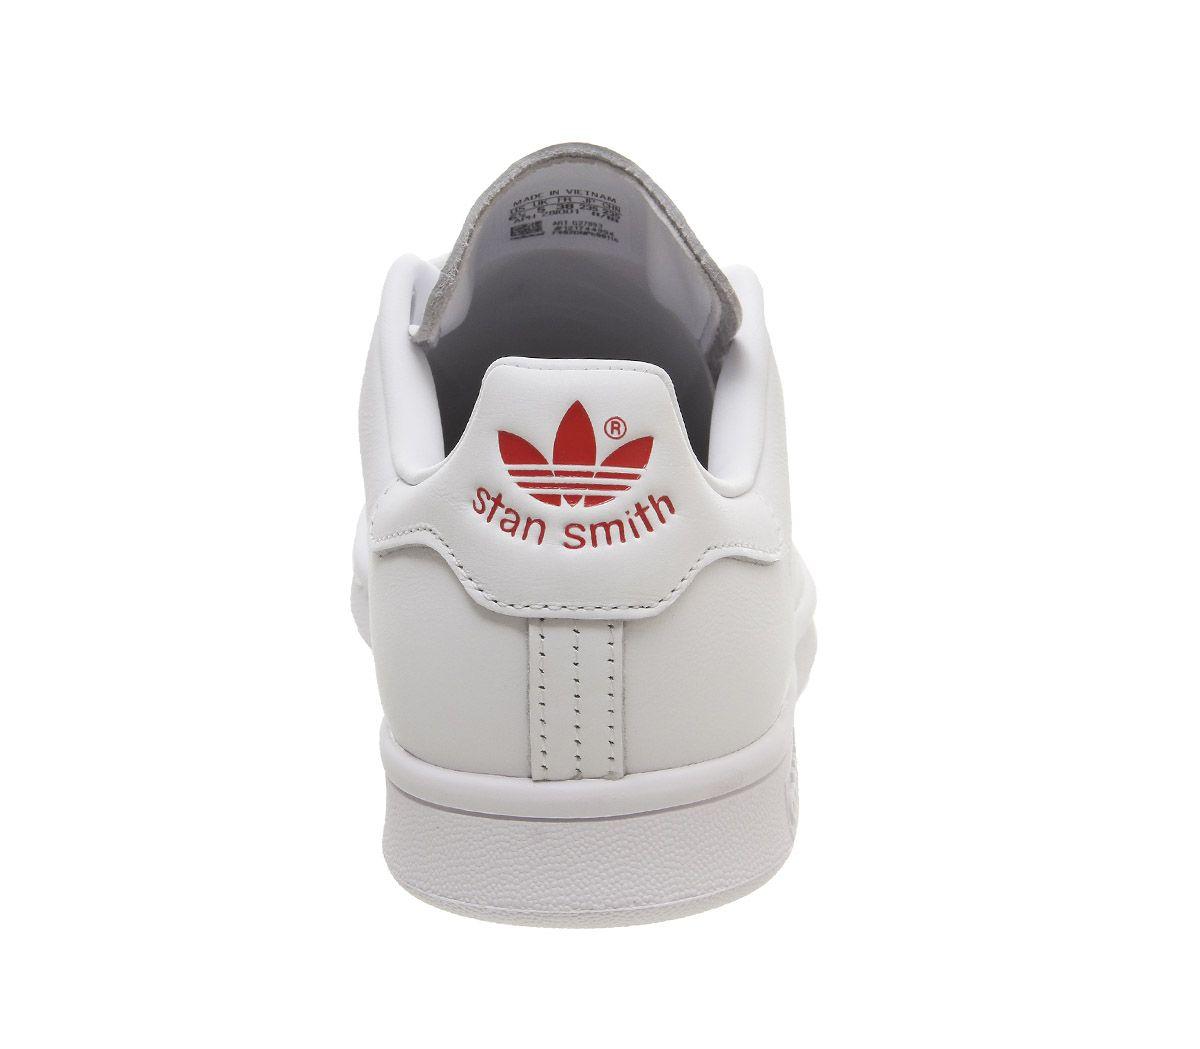 outlet store 6bf93 d3d48 Donna-Adidas-Stan-Smith-Scarpe-da-Ginnastica-Bianche-